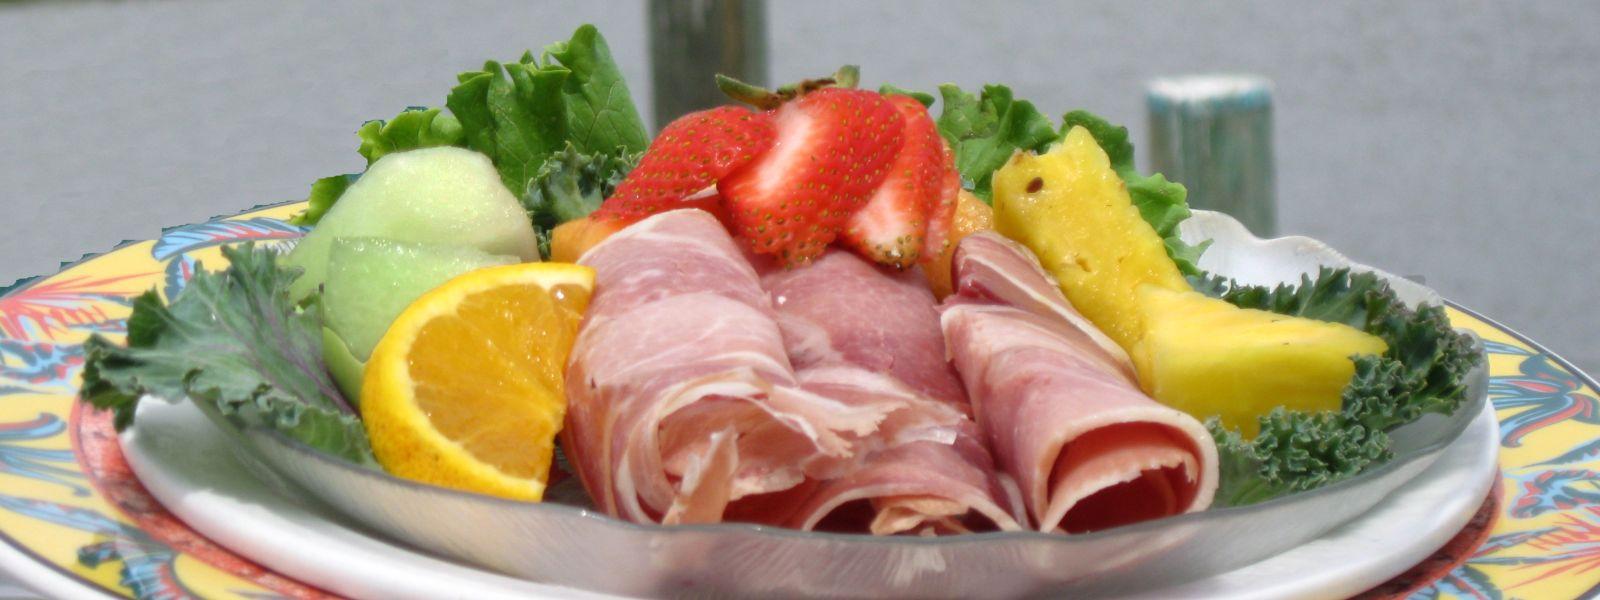 Ham Platter from the Smithfield Station